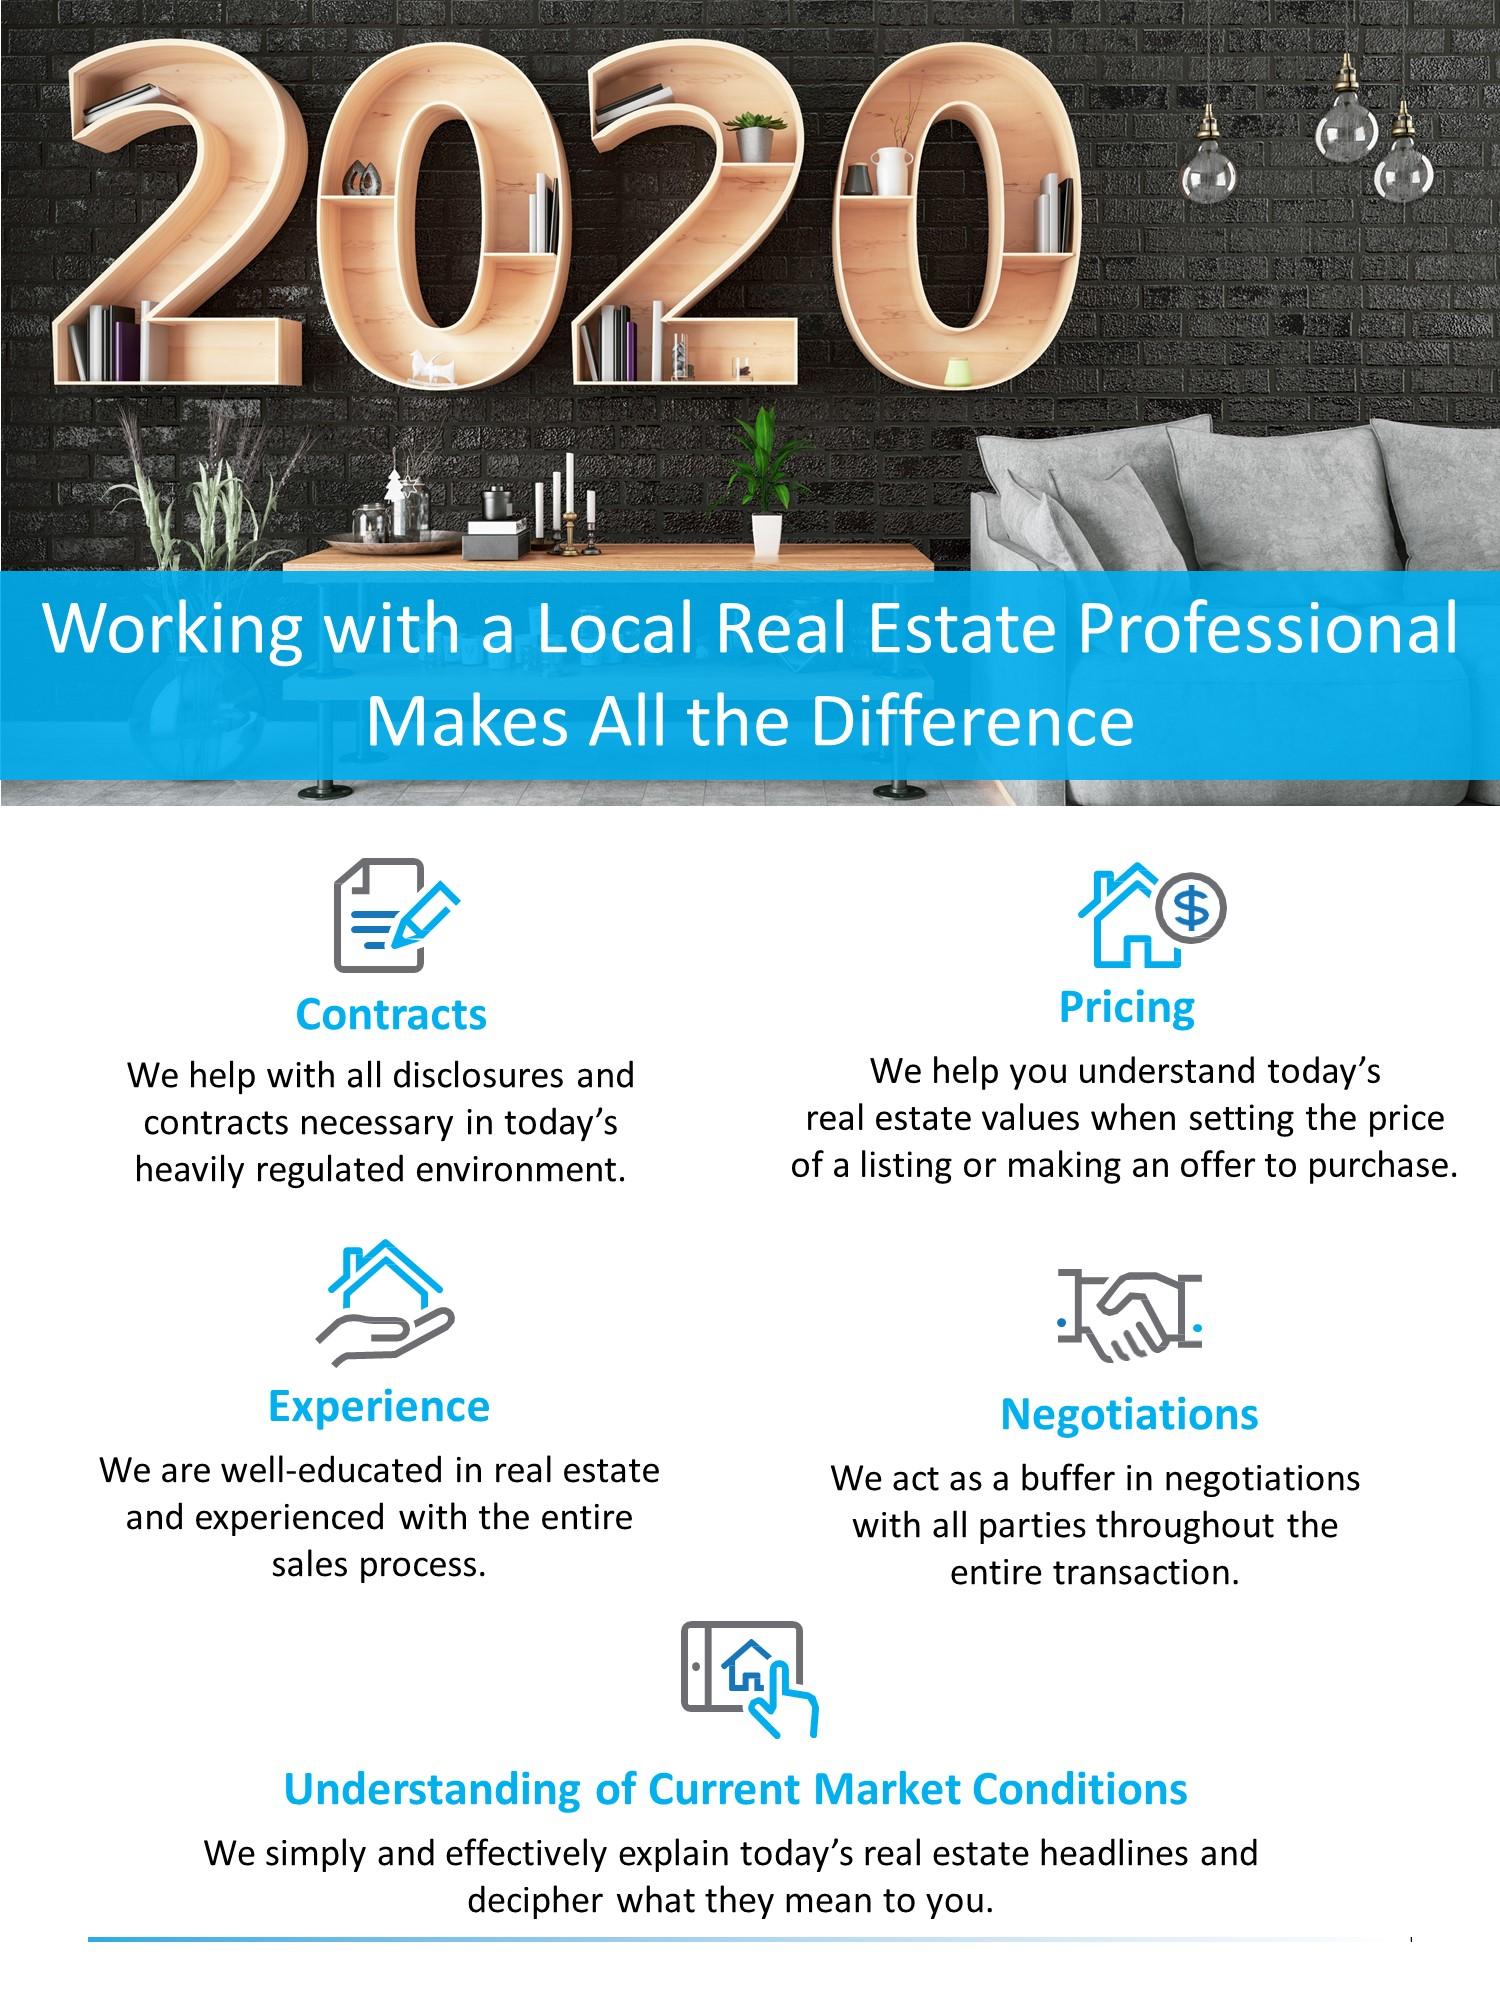 2020 Real Estate